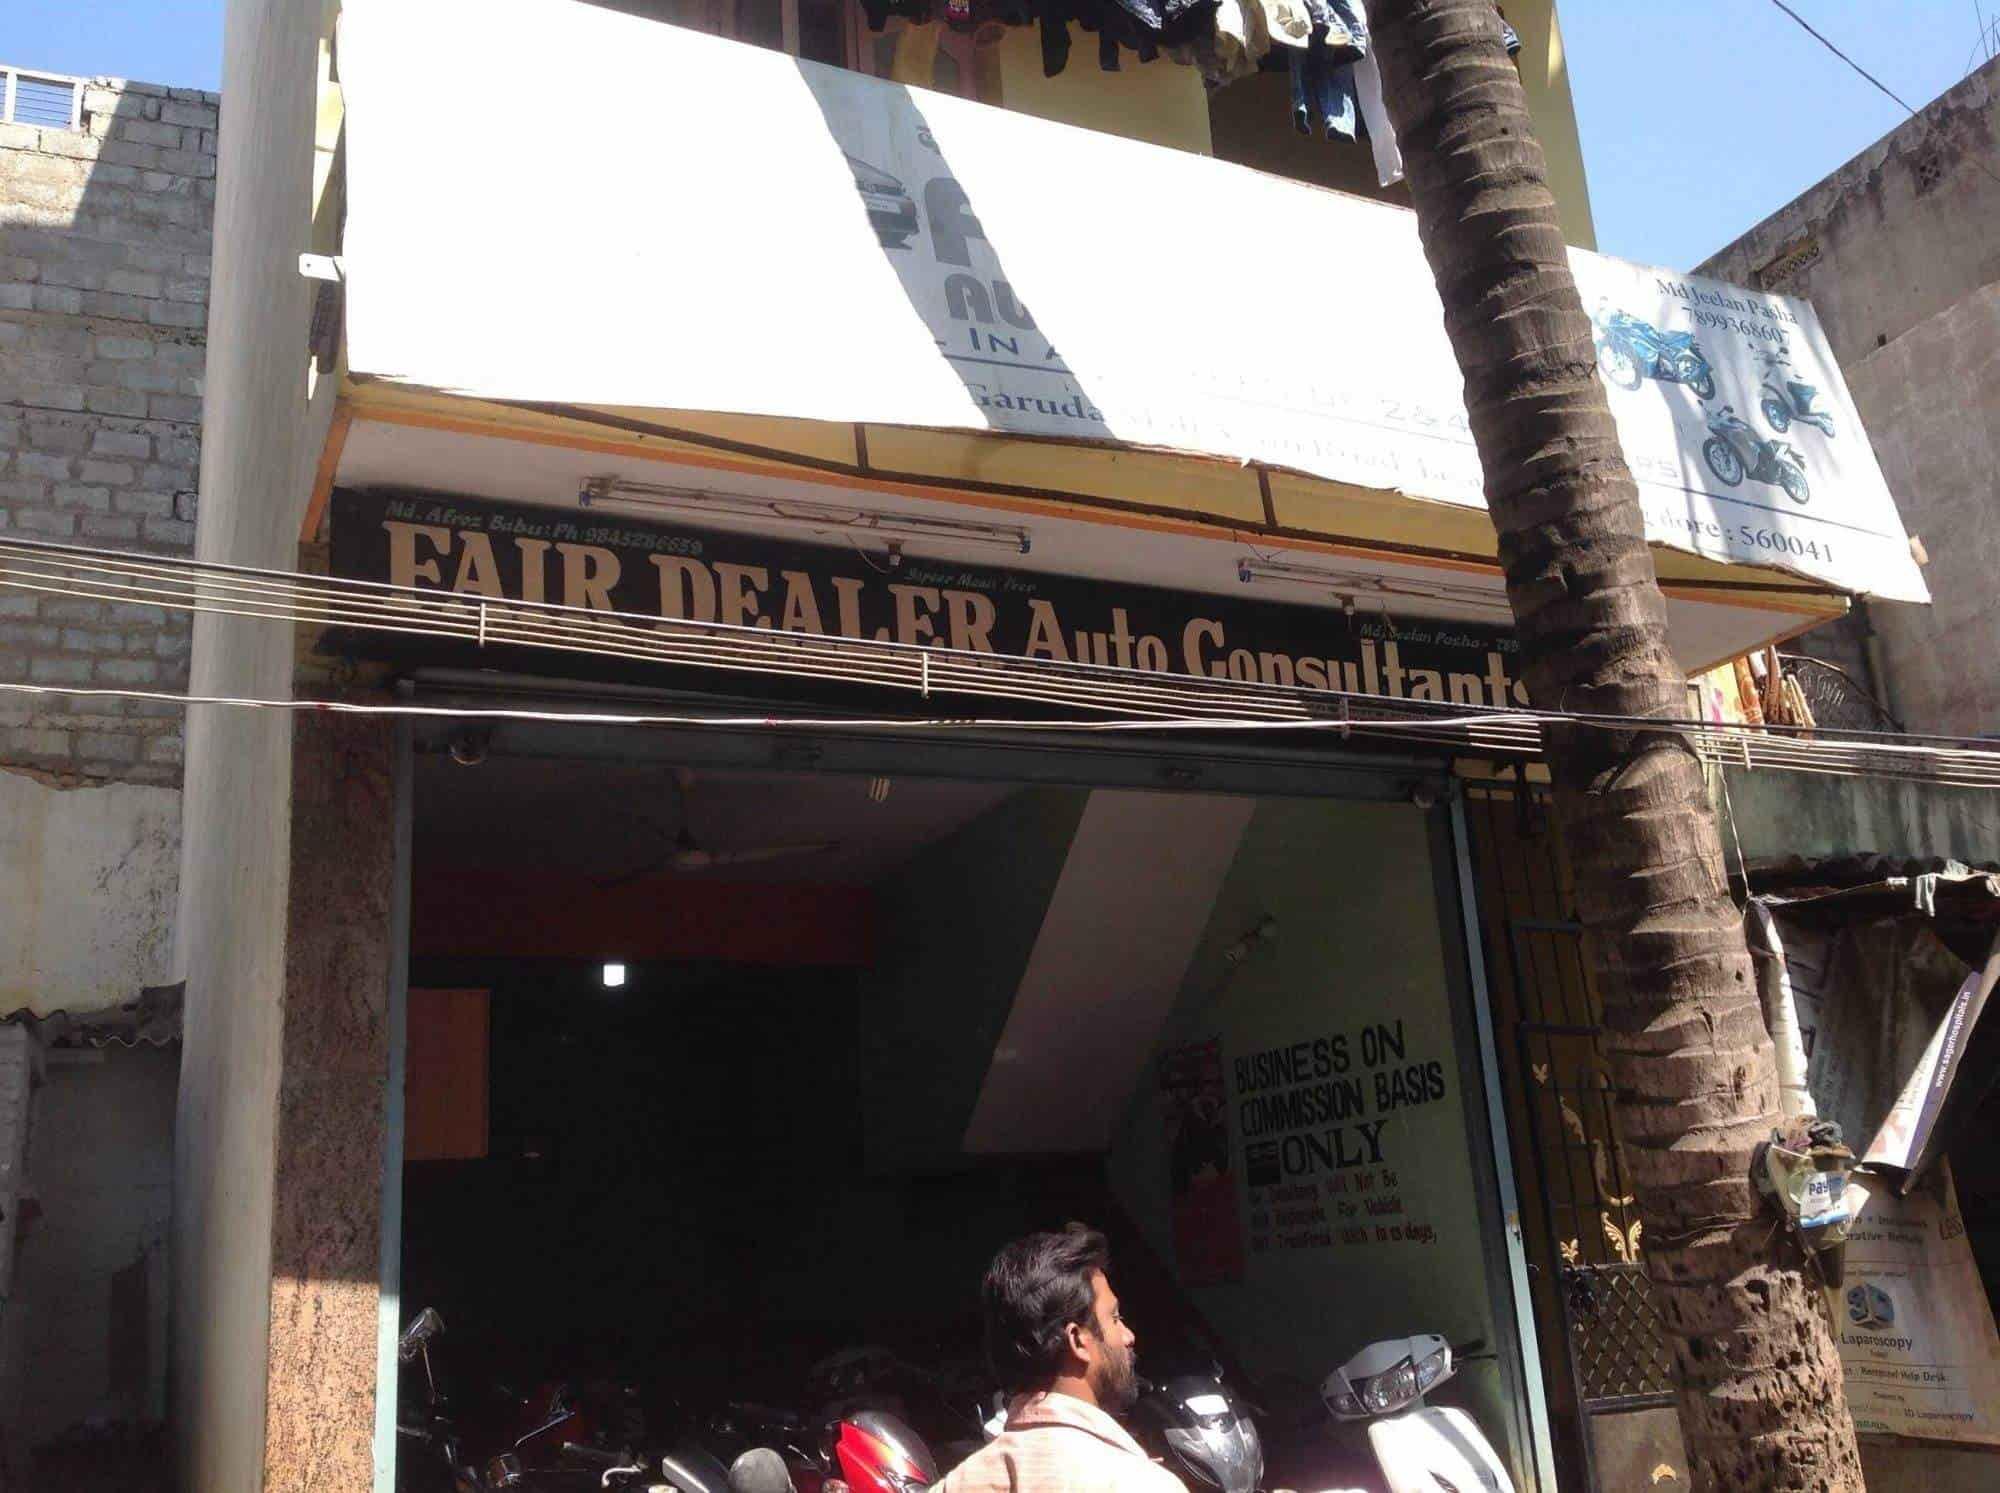 Fair Deal Auto Consultants Jayanagar Automobile Consultants in